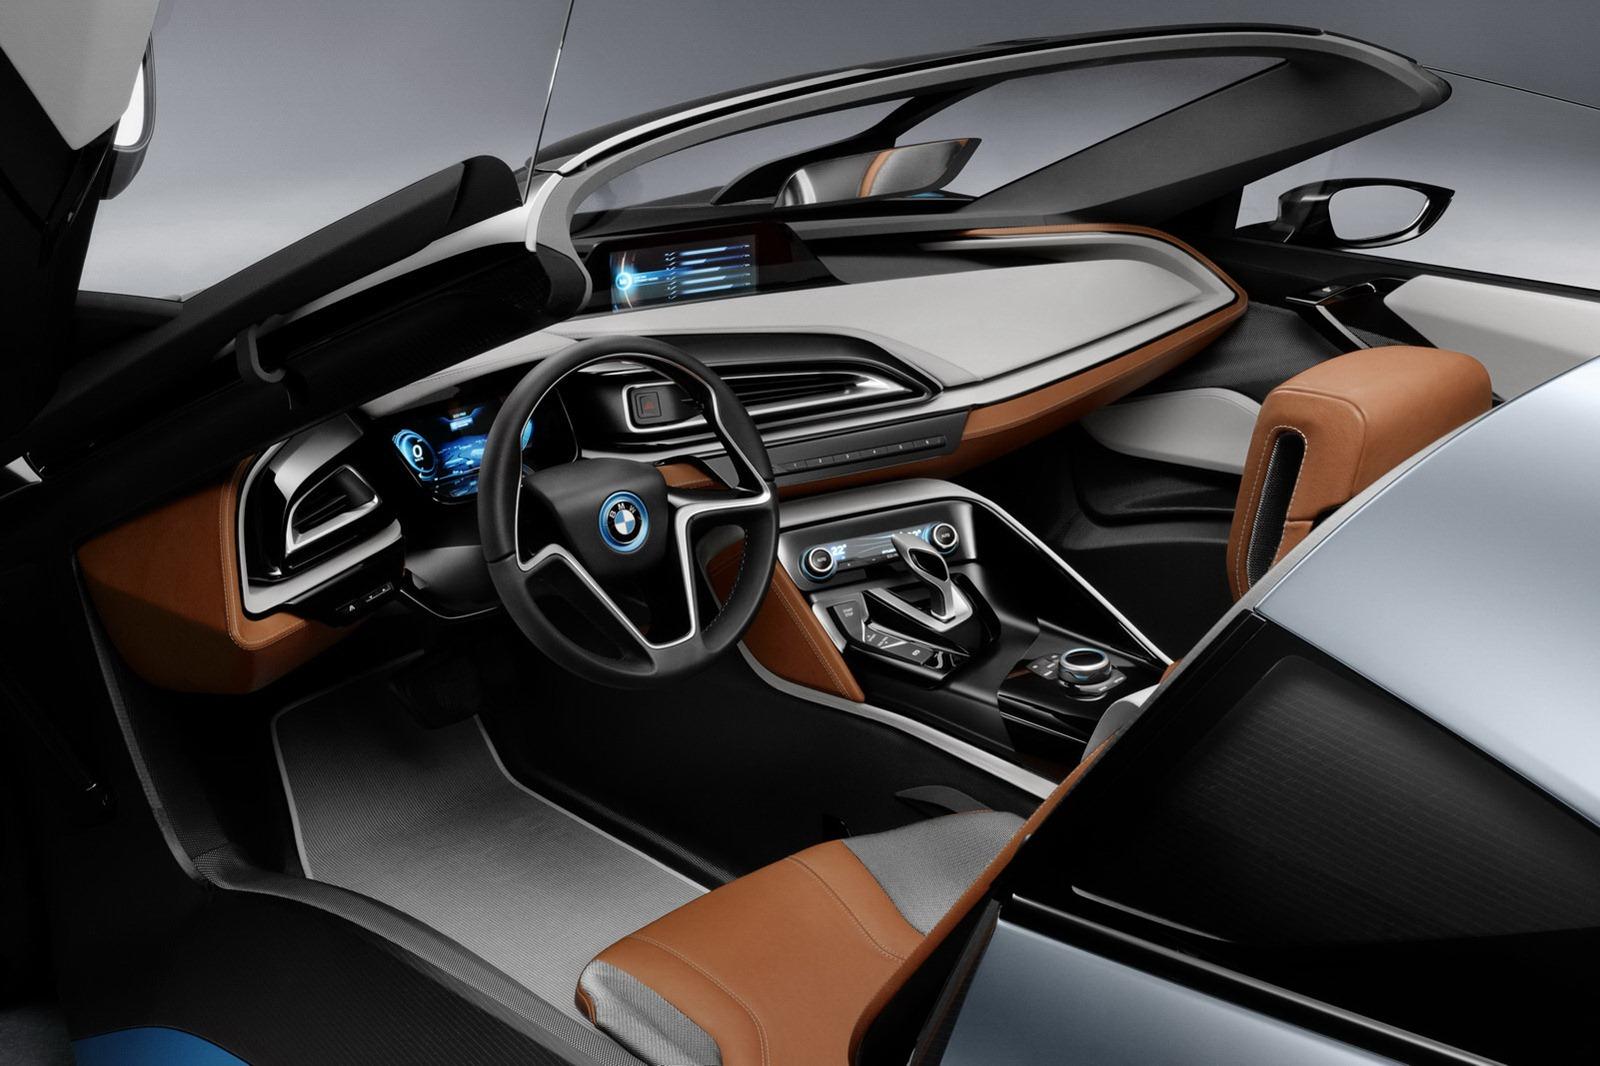 http://2.bp.blogspot.com/-2XeZr622mgY/UMHb_Pr6kPI/AAAAAAAABKc/S2gdC-BrU6c/s1600/BMW-i8+interior.jpg